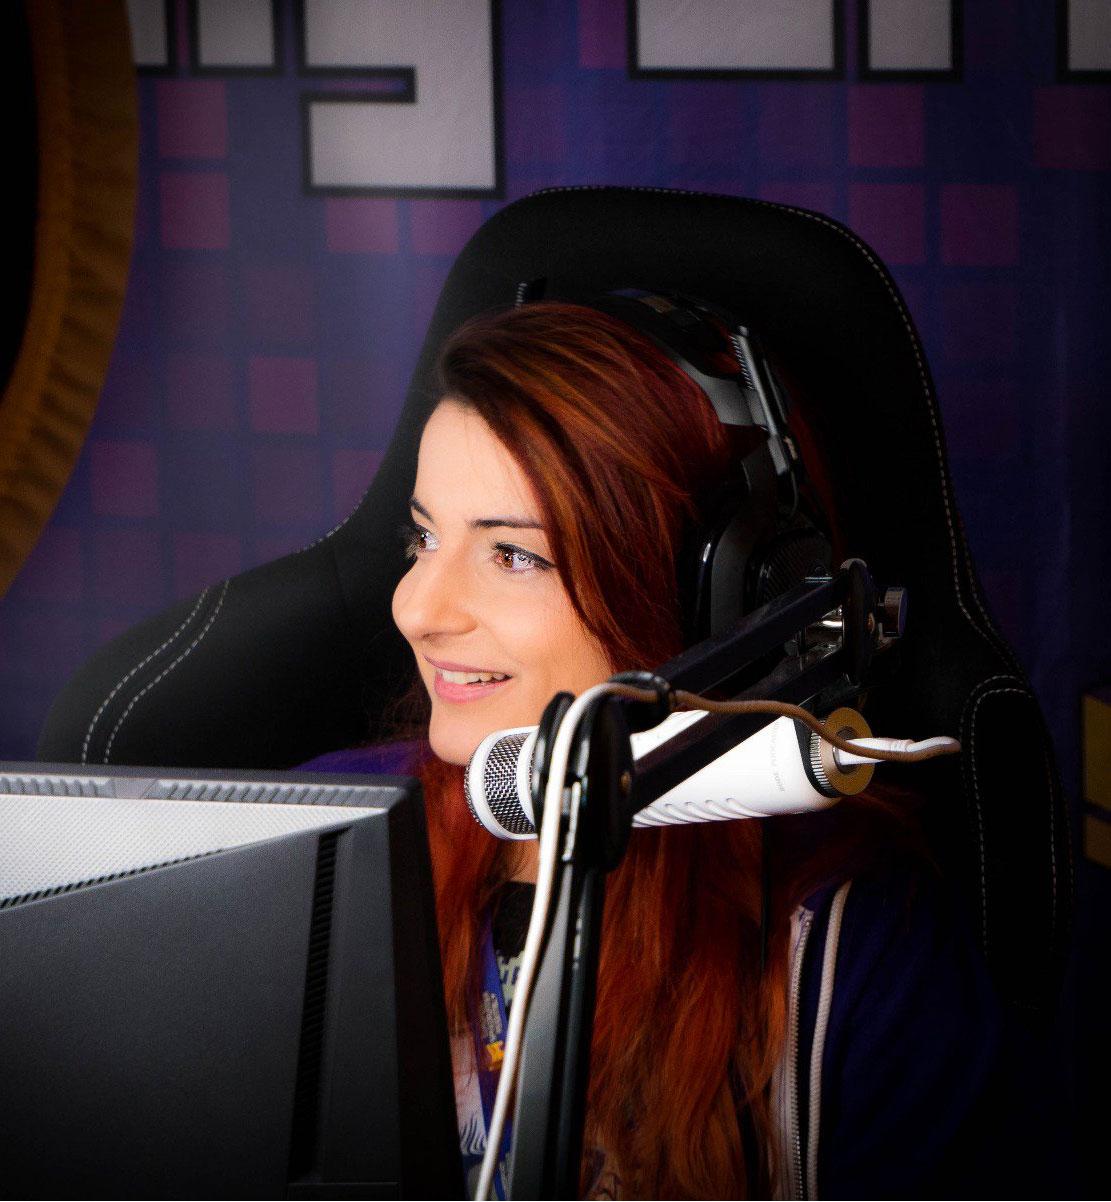 AnnieFuchsia sitter vid en dator